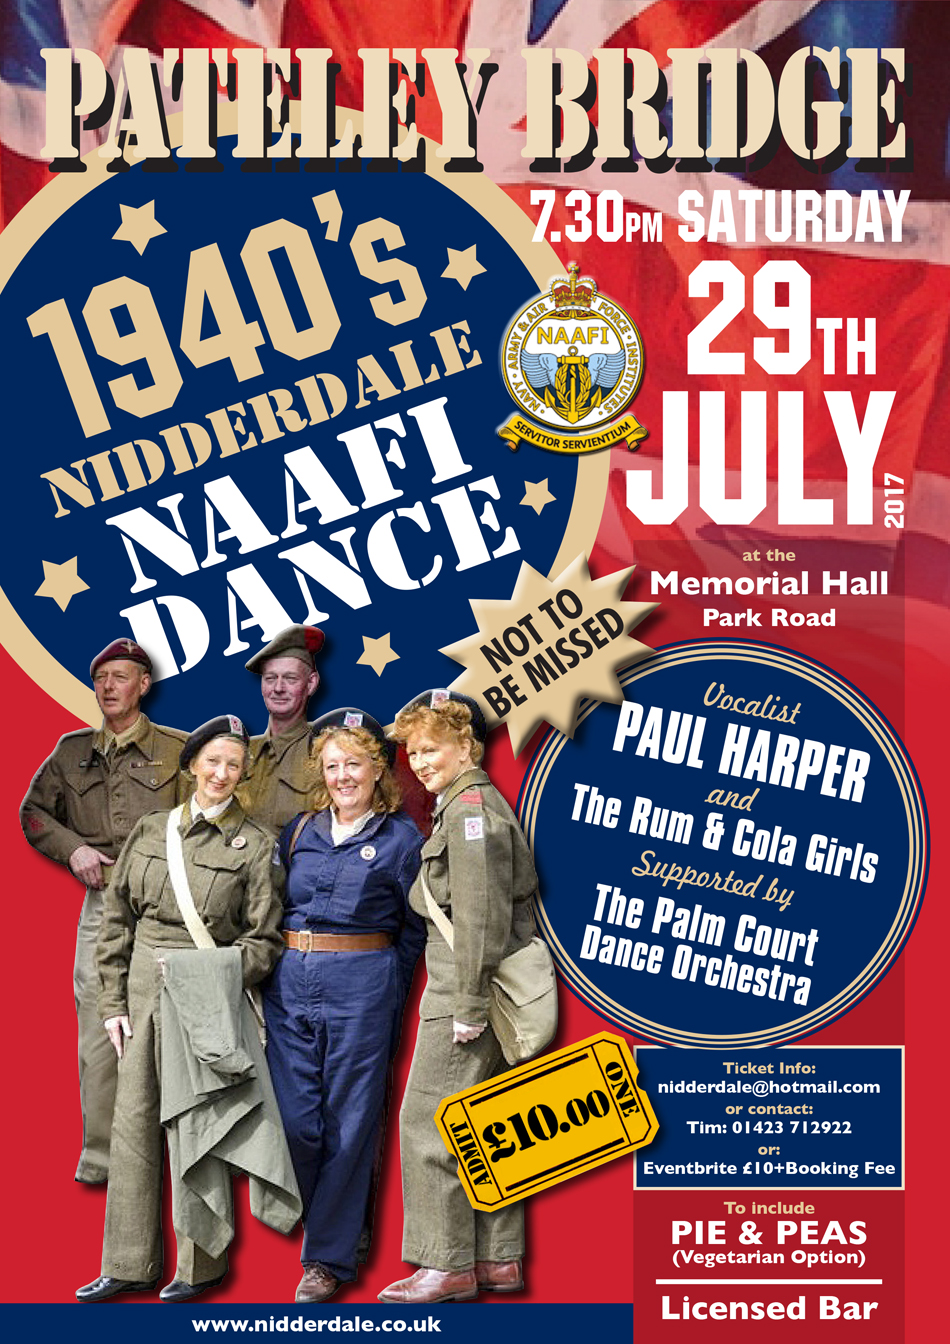 Nidderdale NAAFI Dance